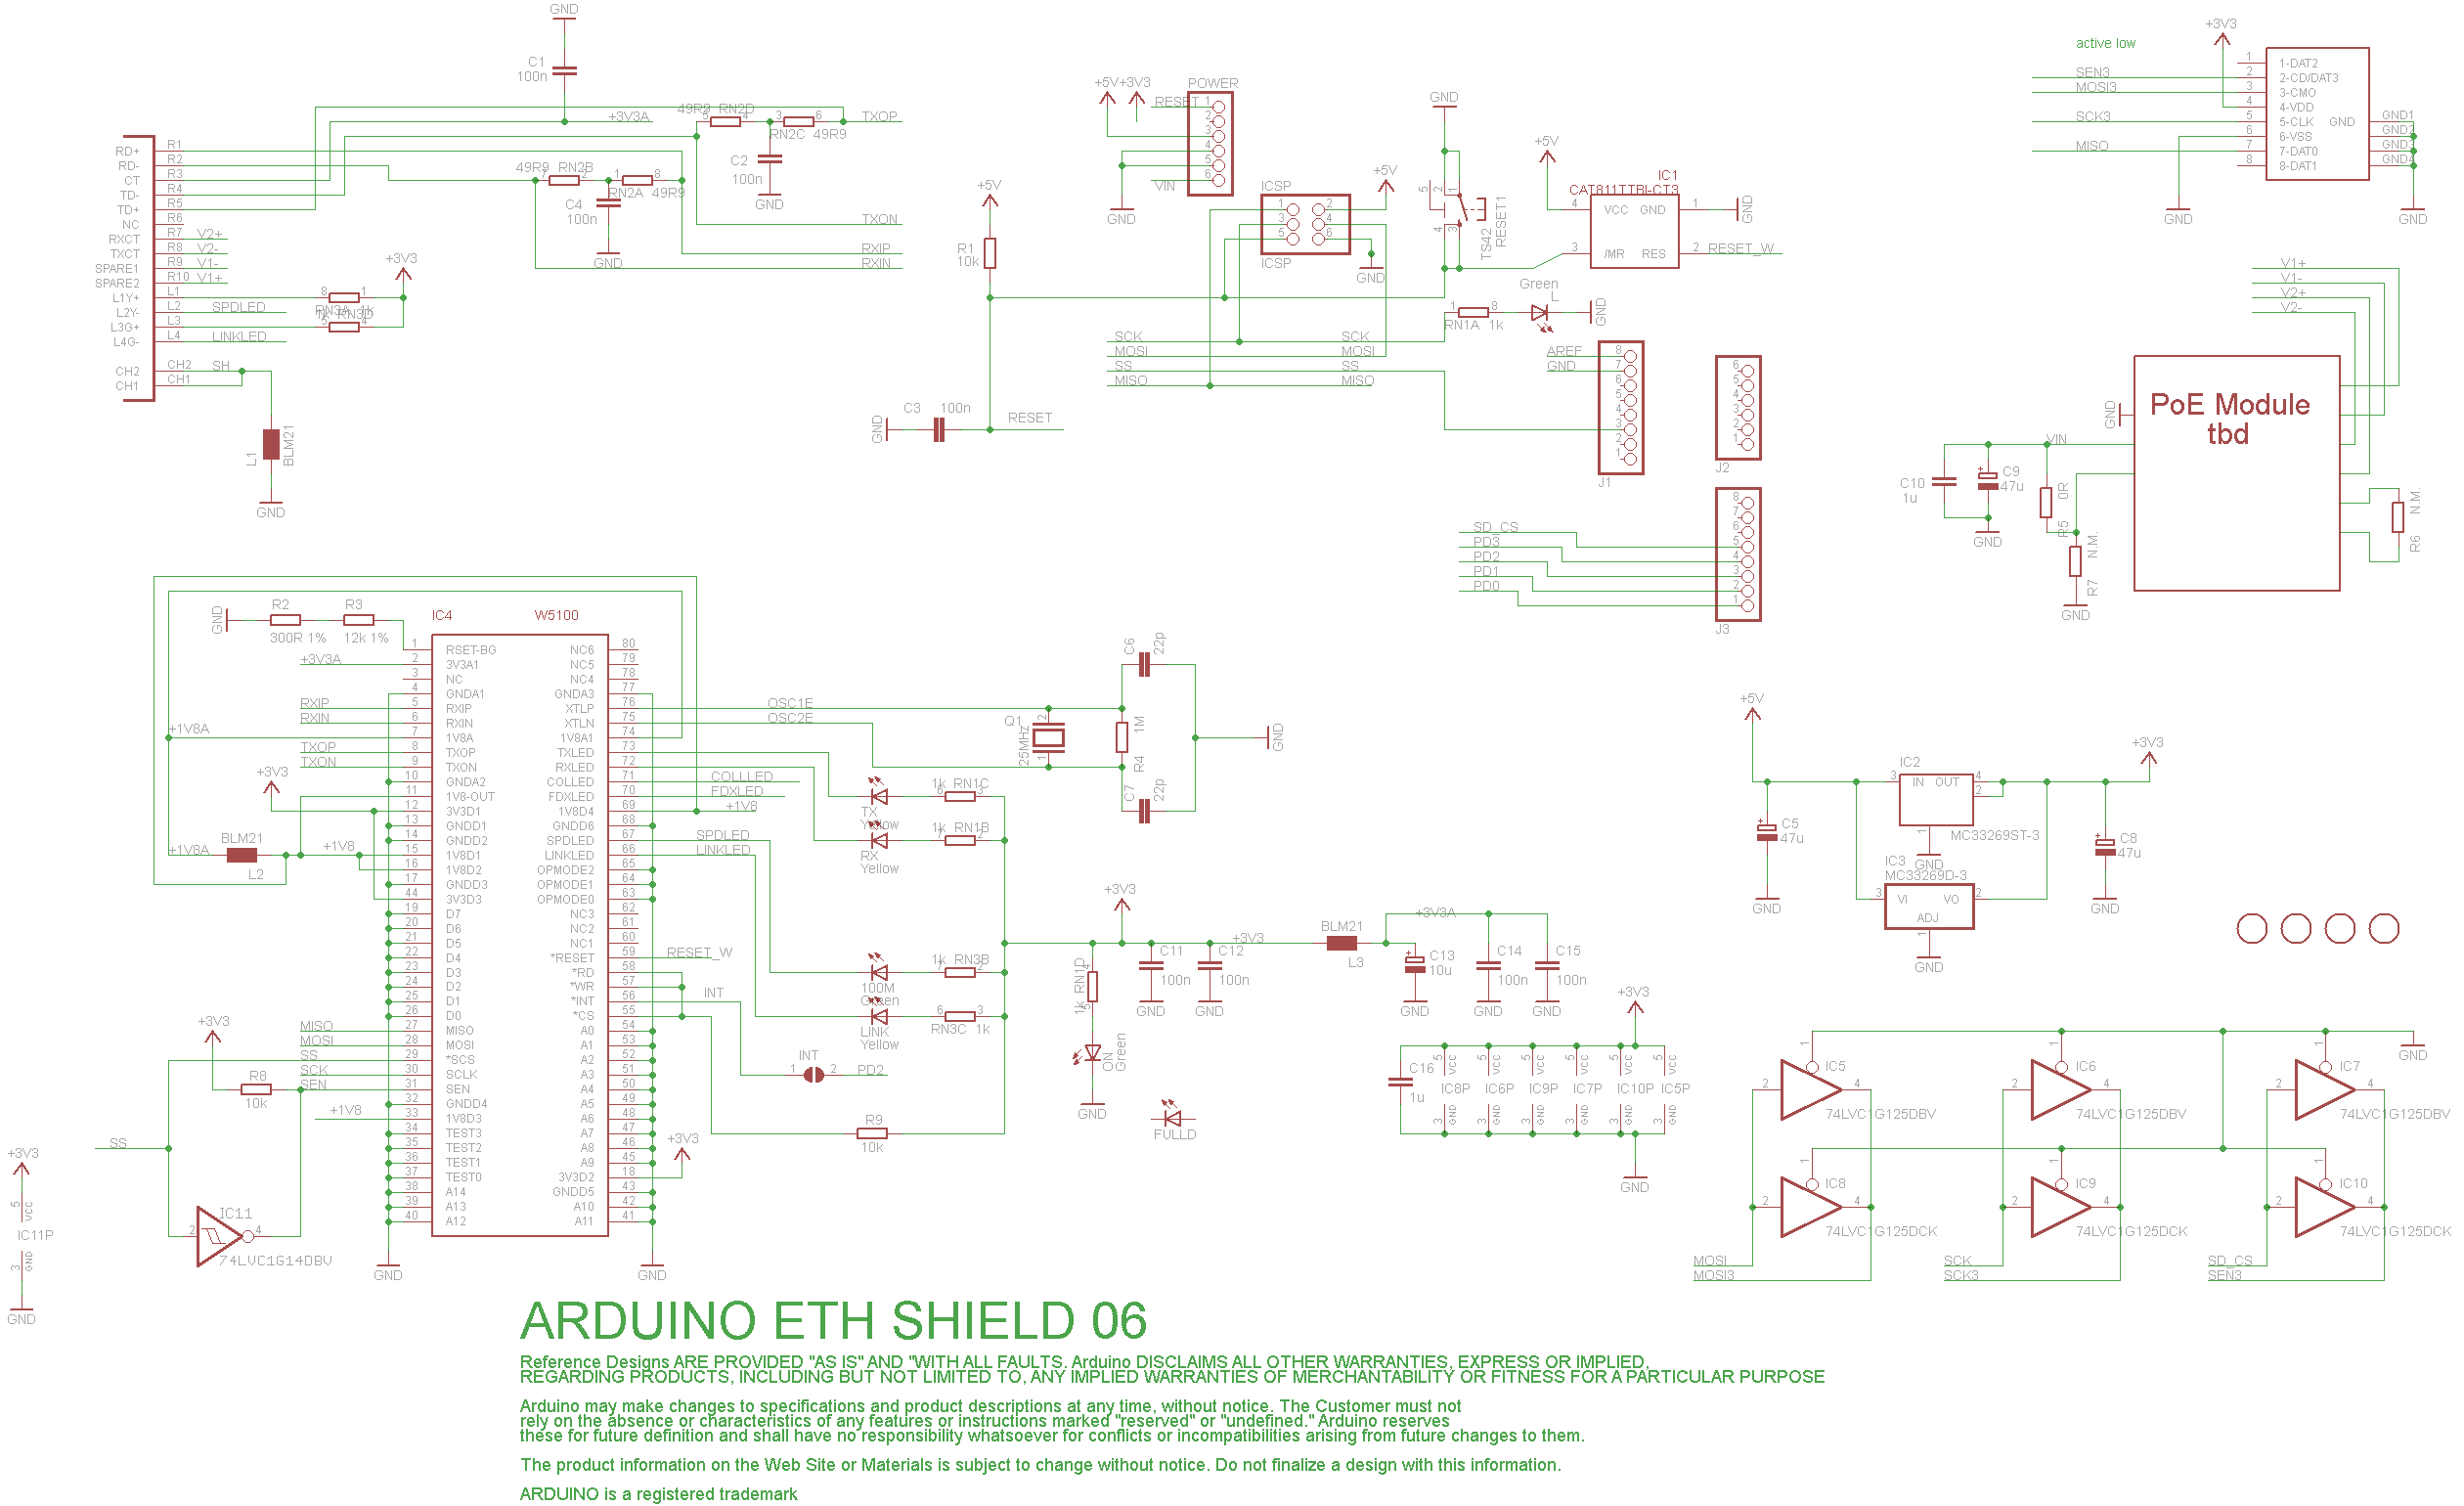 w5100 ethernet shield的原理图有谁可以简单解释一